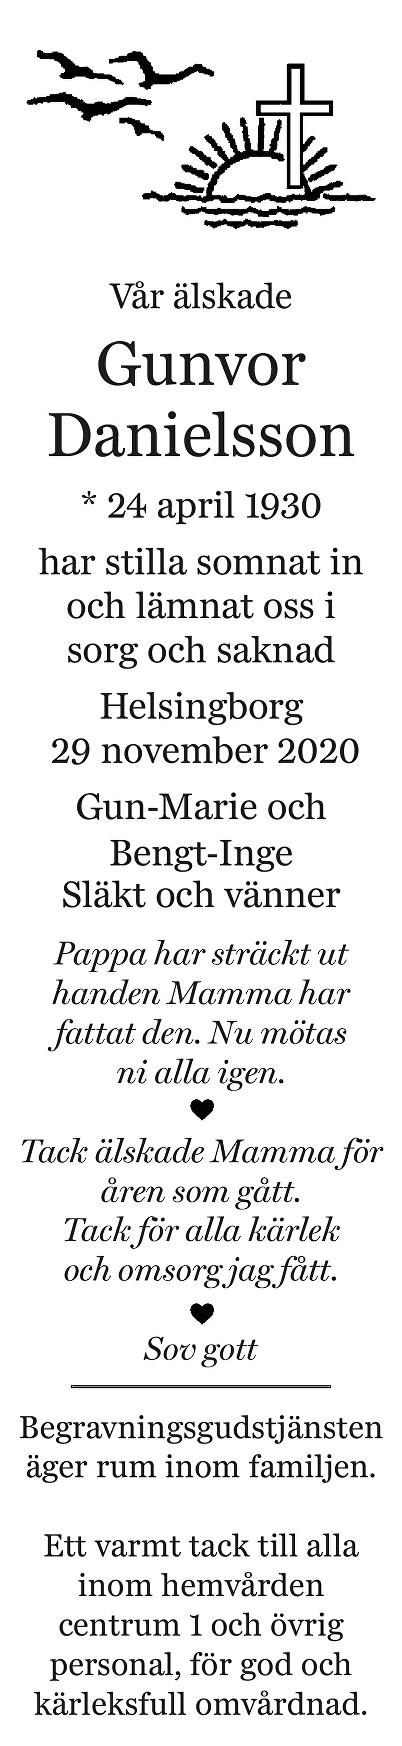 Gunvor Danielsson Death notice